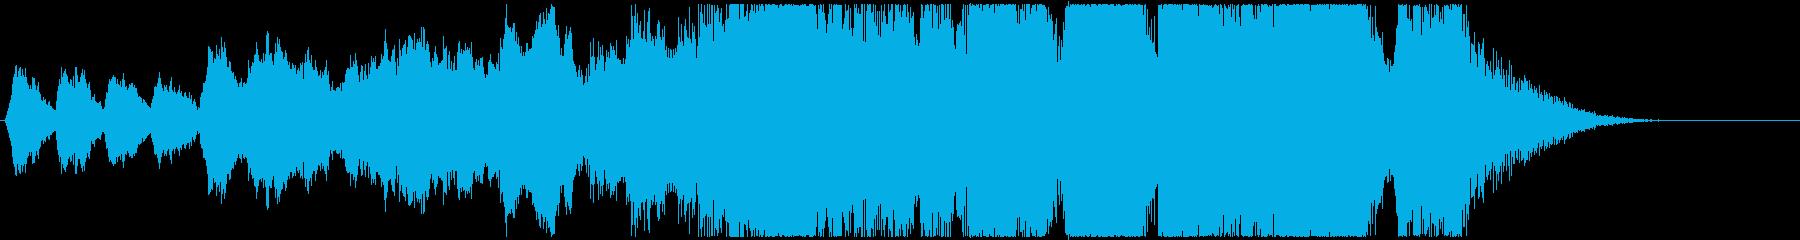 Inspiring Fanfareの再生済みの波形